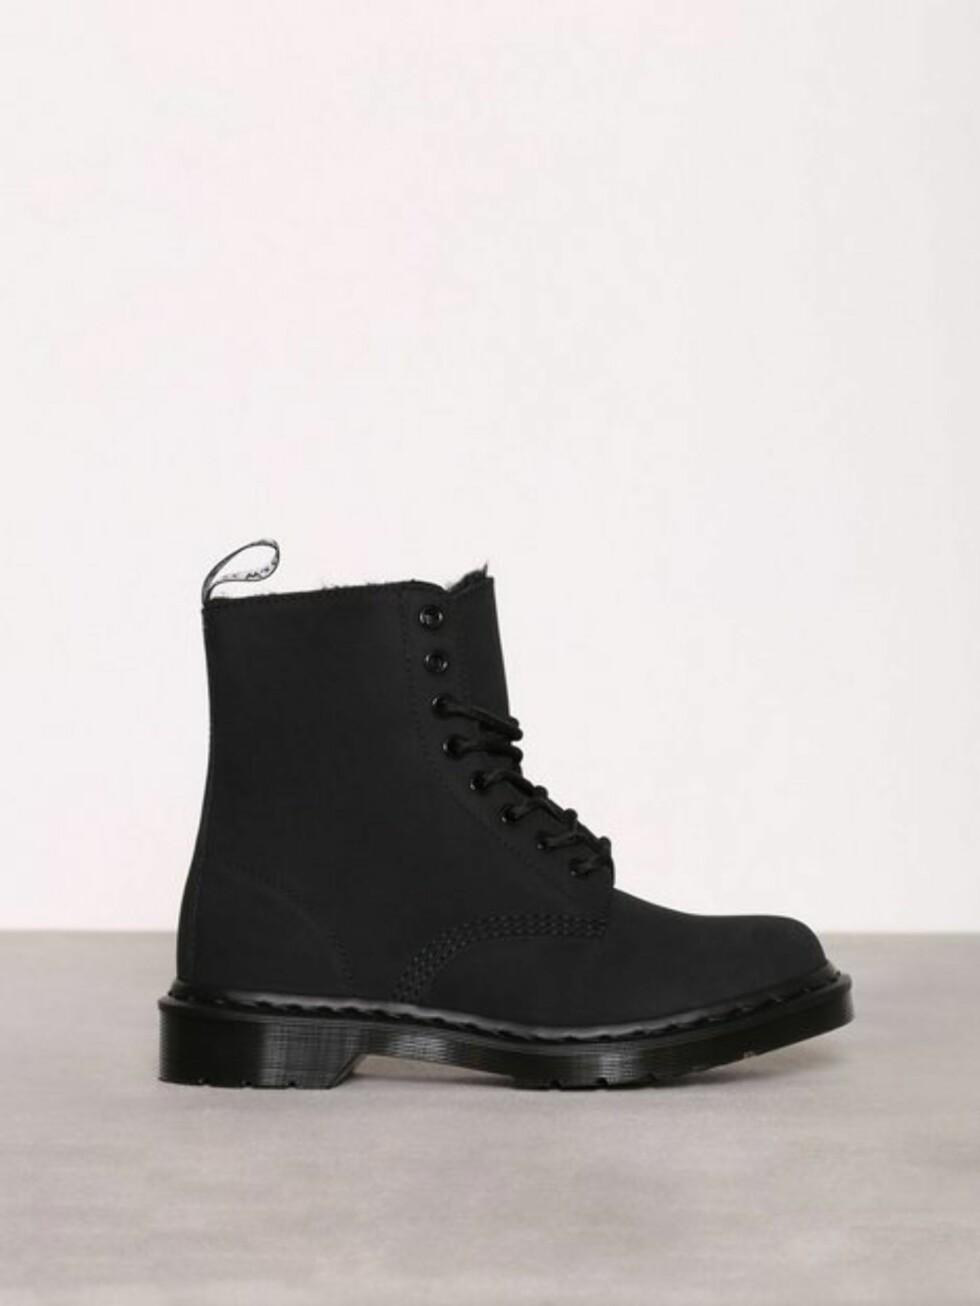 Sko fra Dr Martens via Nelly.com |1799,-| https://nelly.com/no/kl%C3%A6r-til-kvinner/sko/boots-booties/dr-martens-100309/1406-mono-309071-0014/